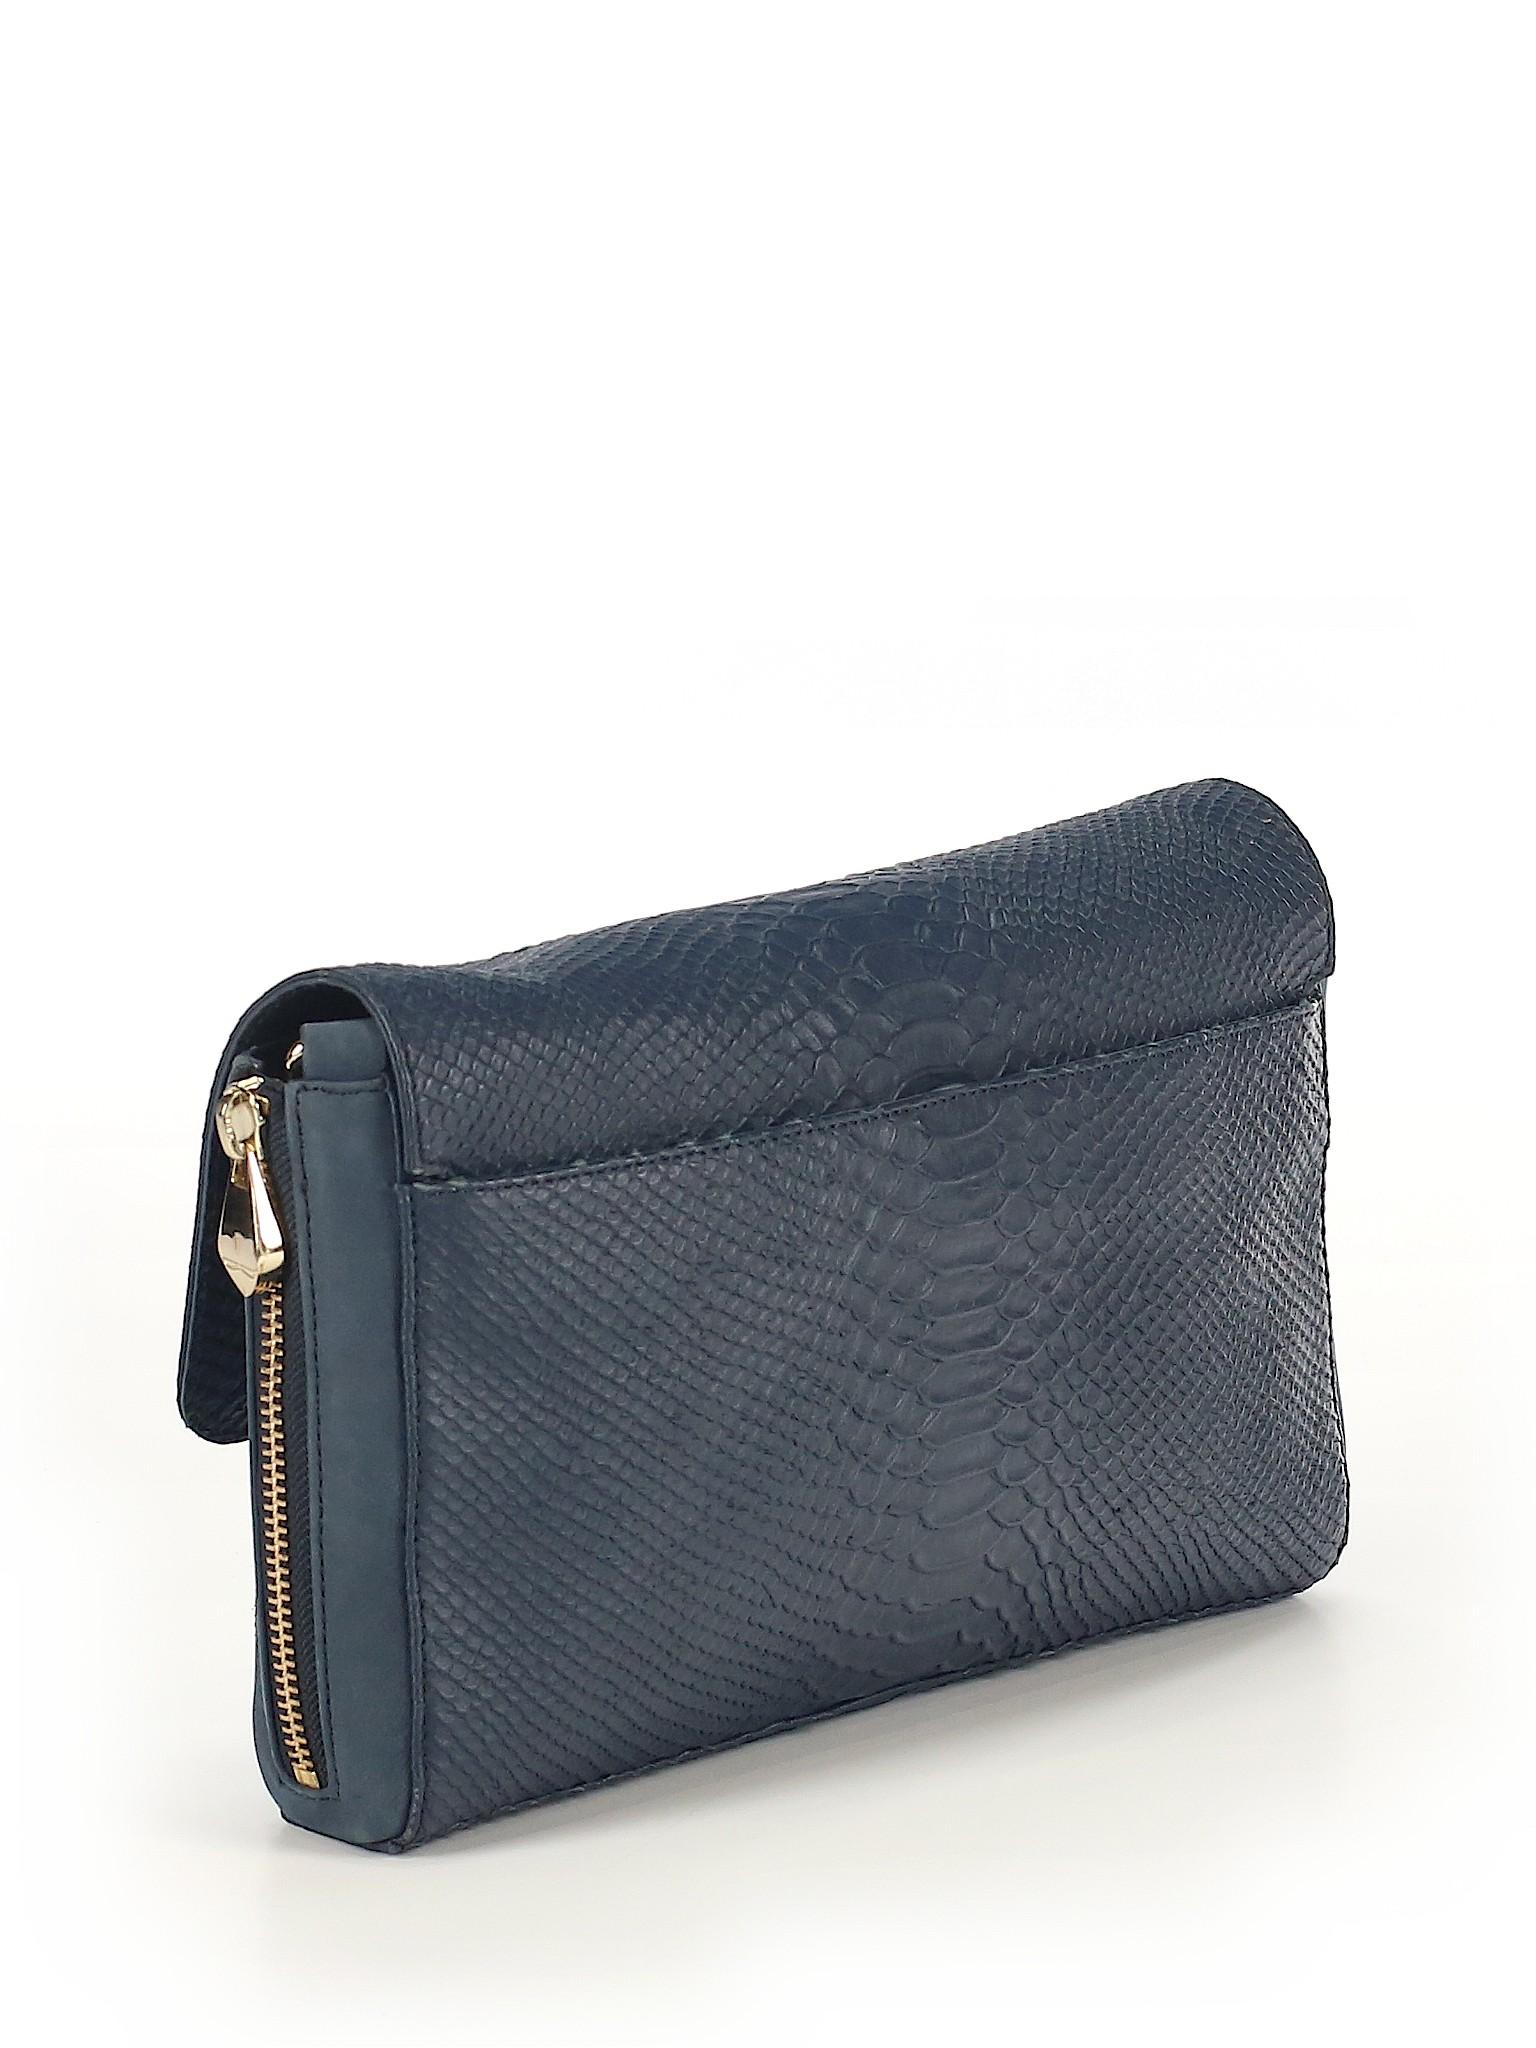 Pour La Victoire Solid Dark Blue Crossbody Bag One Size - 80% off ... b13a404c05168